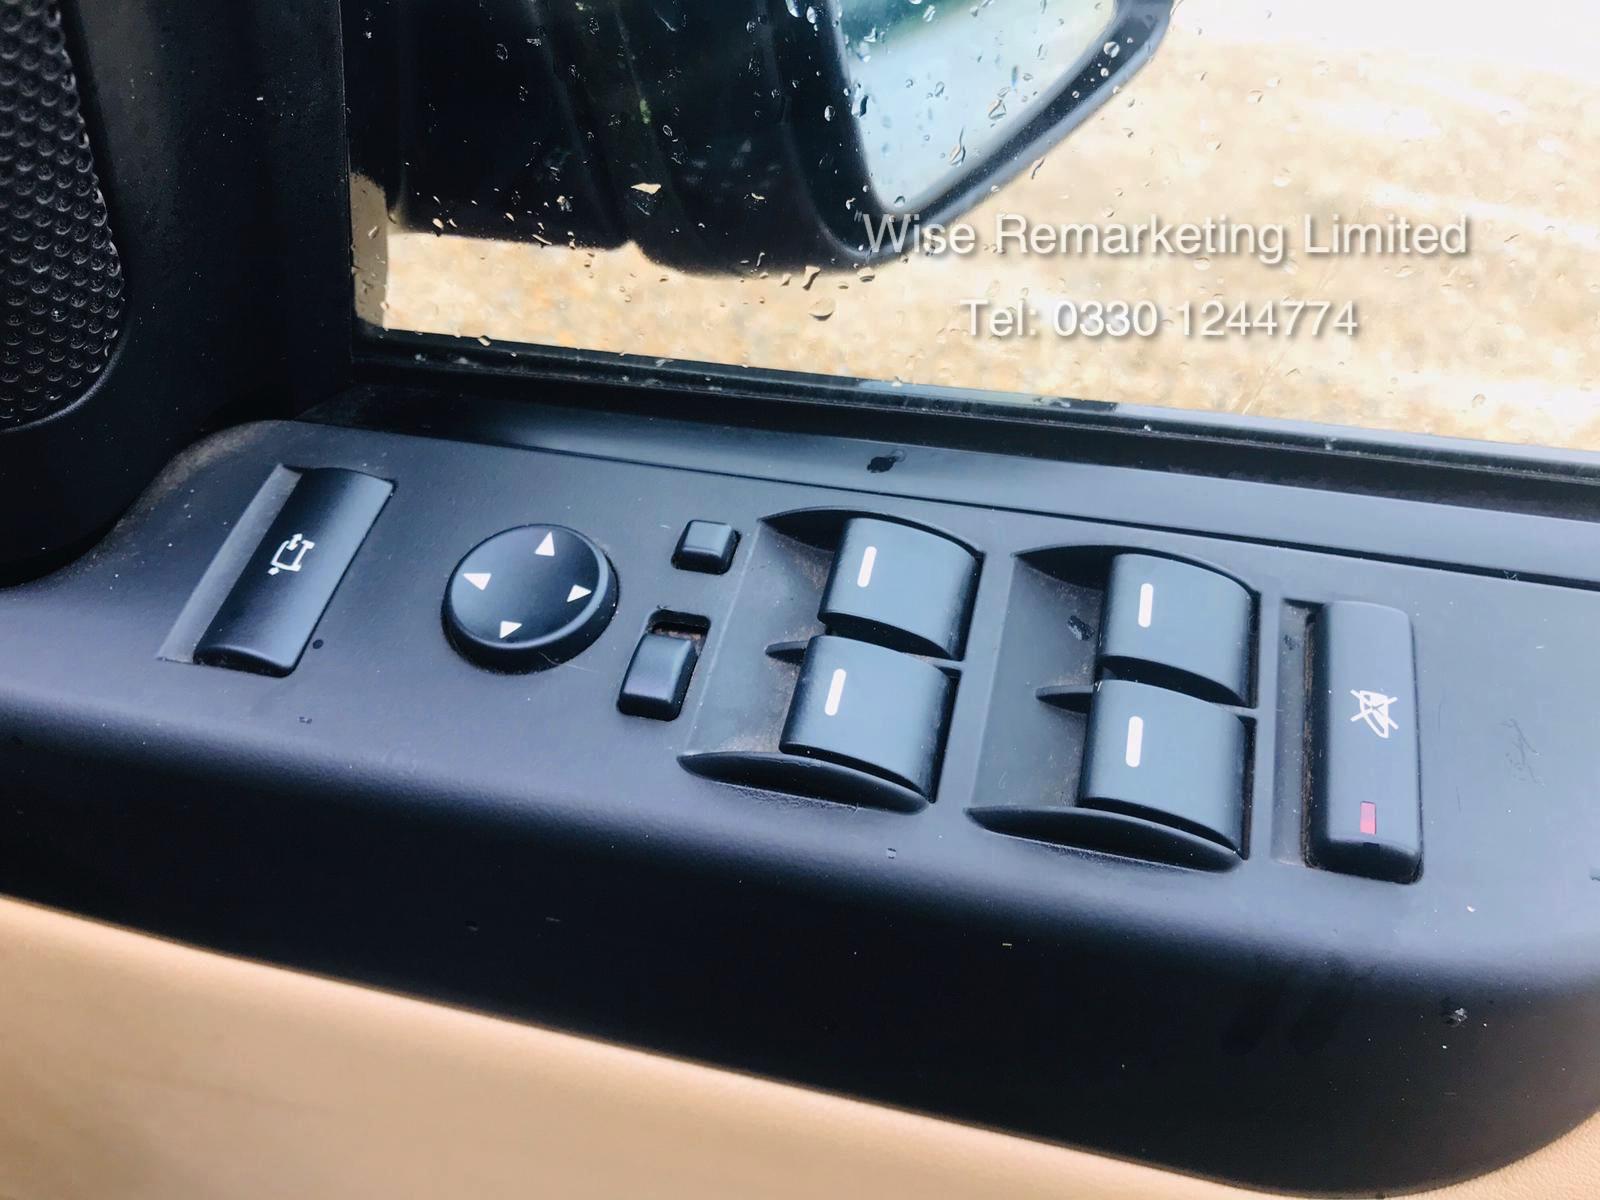 Range Rover Vogue 3.6 TDV8 HSE Auto - 2010 Model - Cream Leather - Service History - - Image 18 of 28